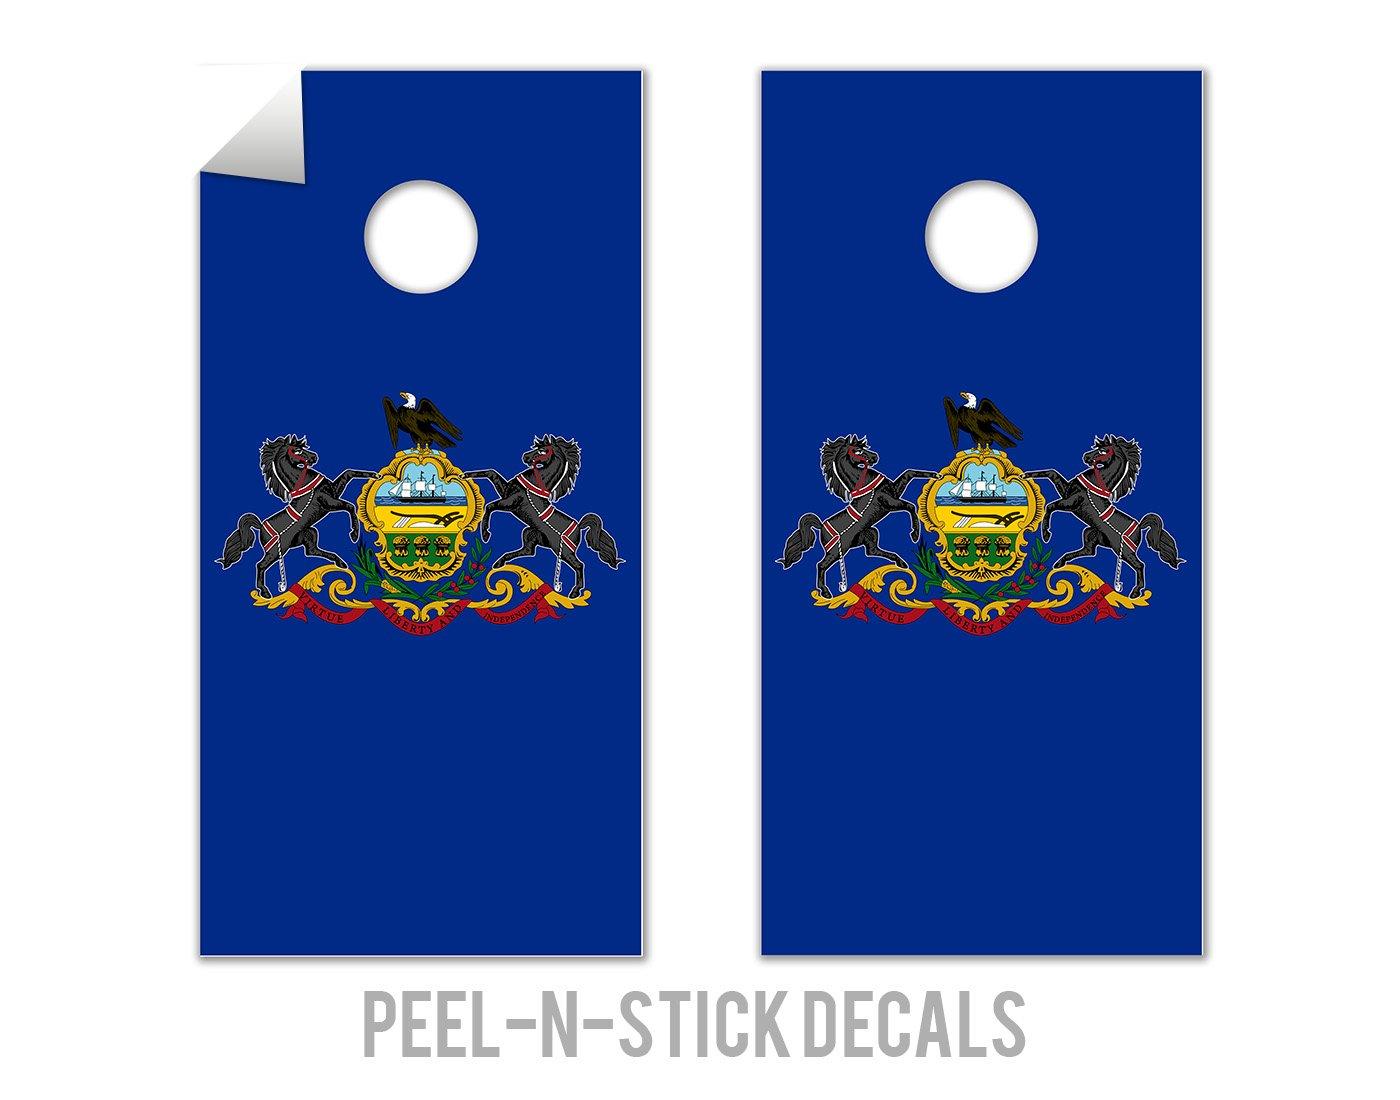 Pennsylvania State Flag - Cornhole Crew - ACA Regulation Size Cornhole Board Decals by The Cornhole Crew